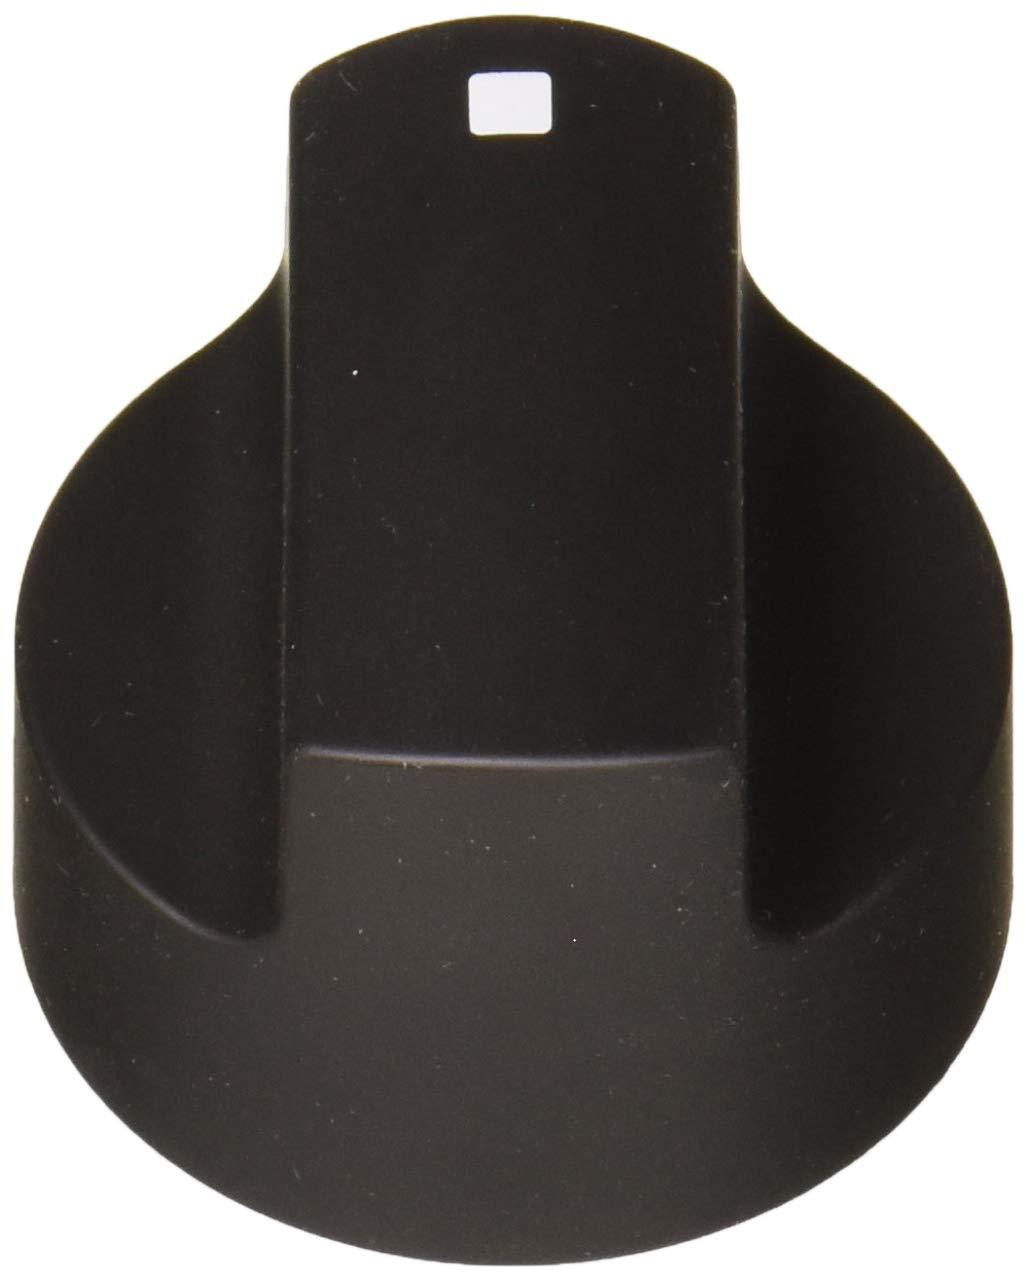 Bertazzoni 4010123 ELECTRIC COMMUTATOR KNOB BLACK